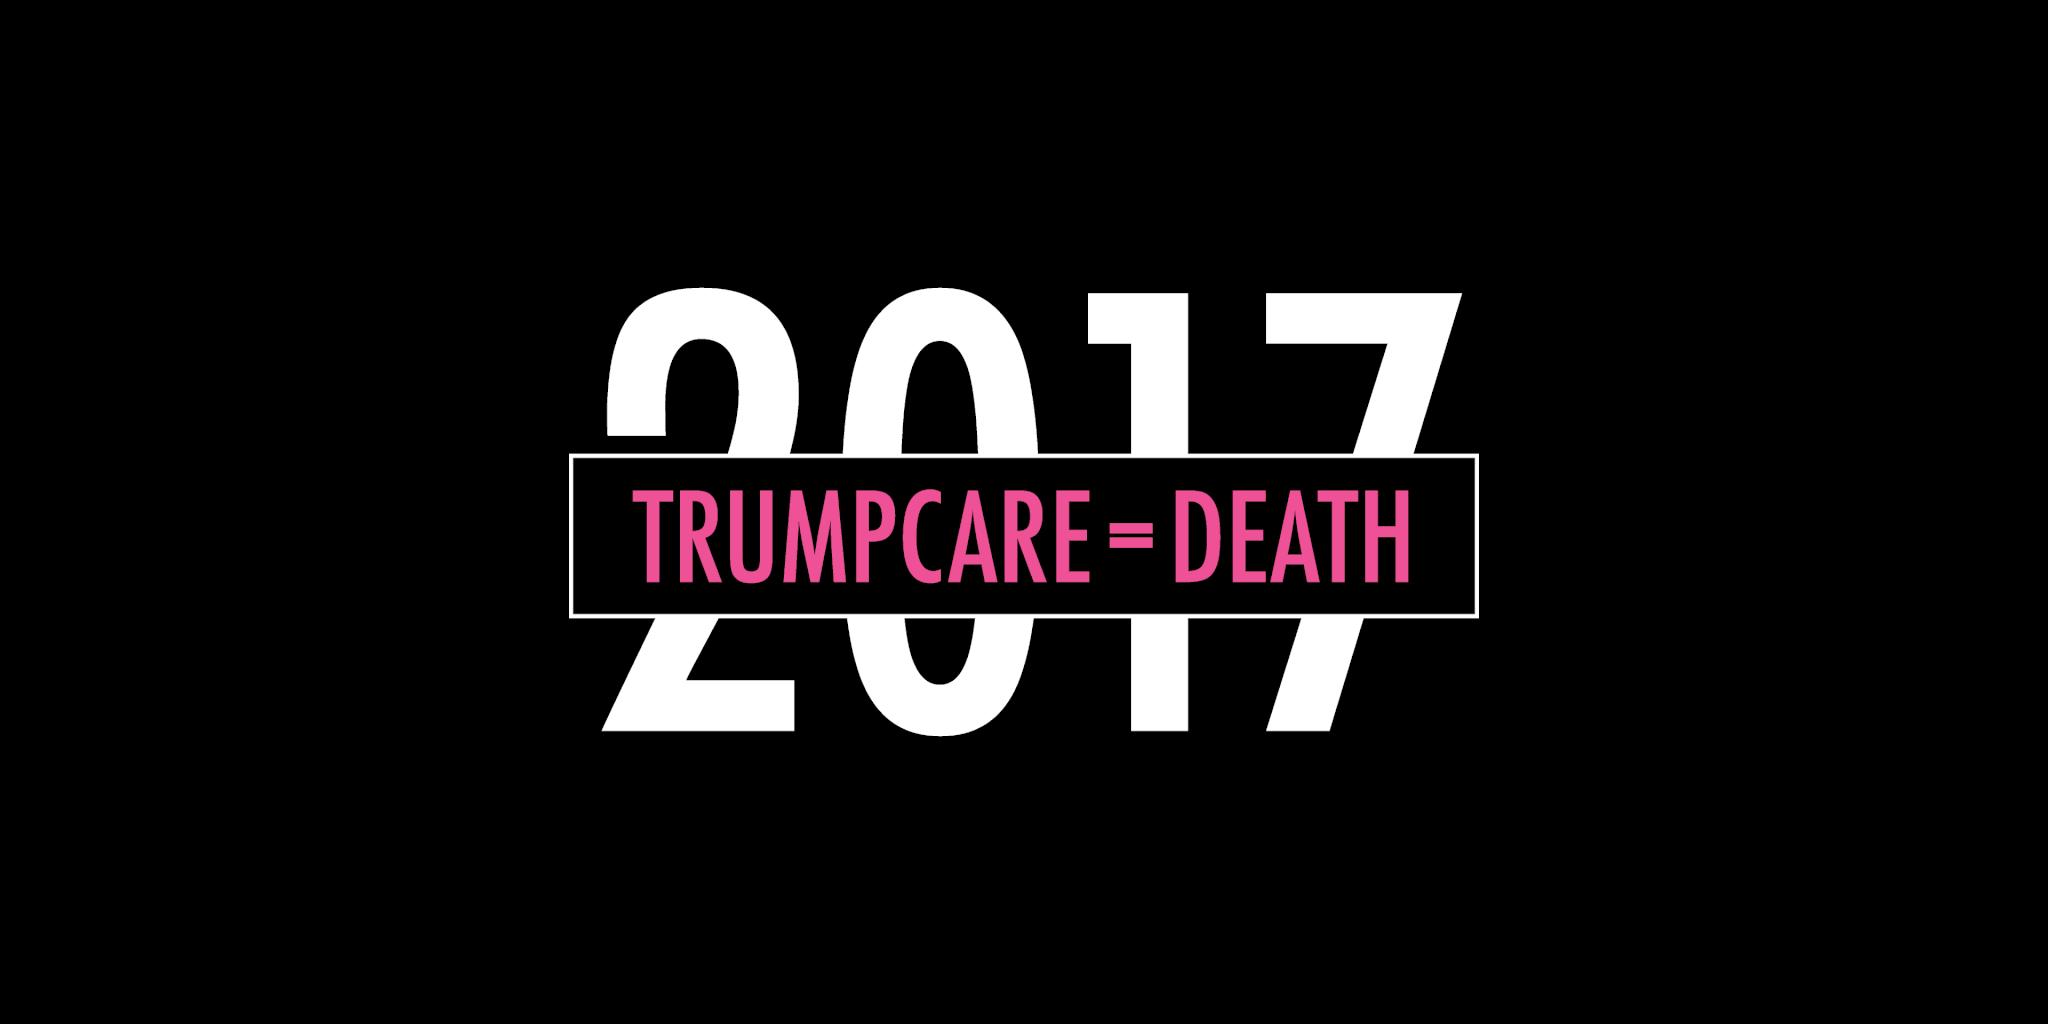 APLA Health Trumpcare Graphic Design Marketing Campaign On Case Study Page